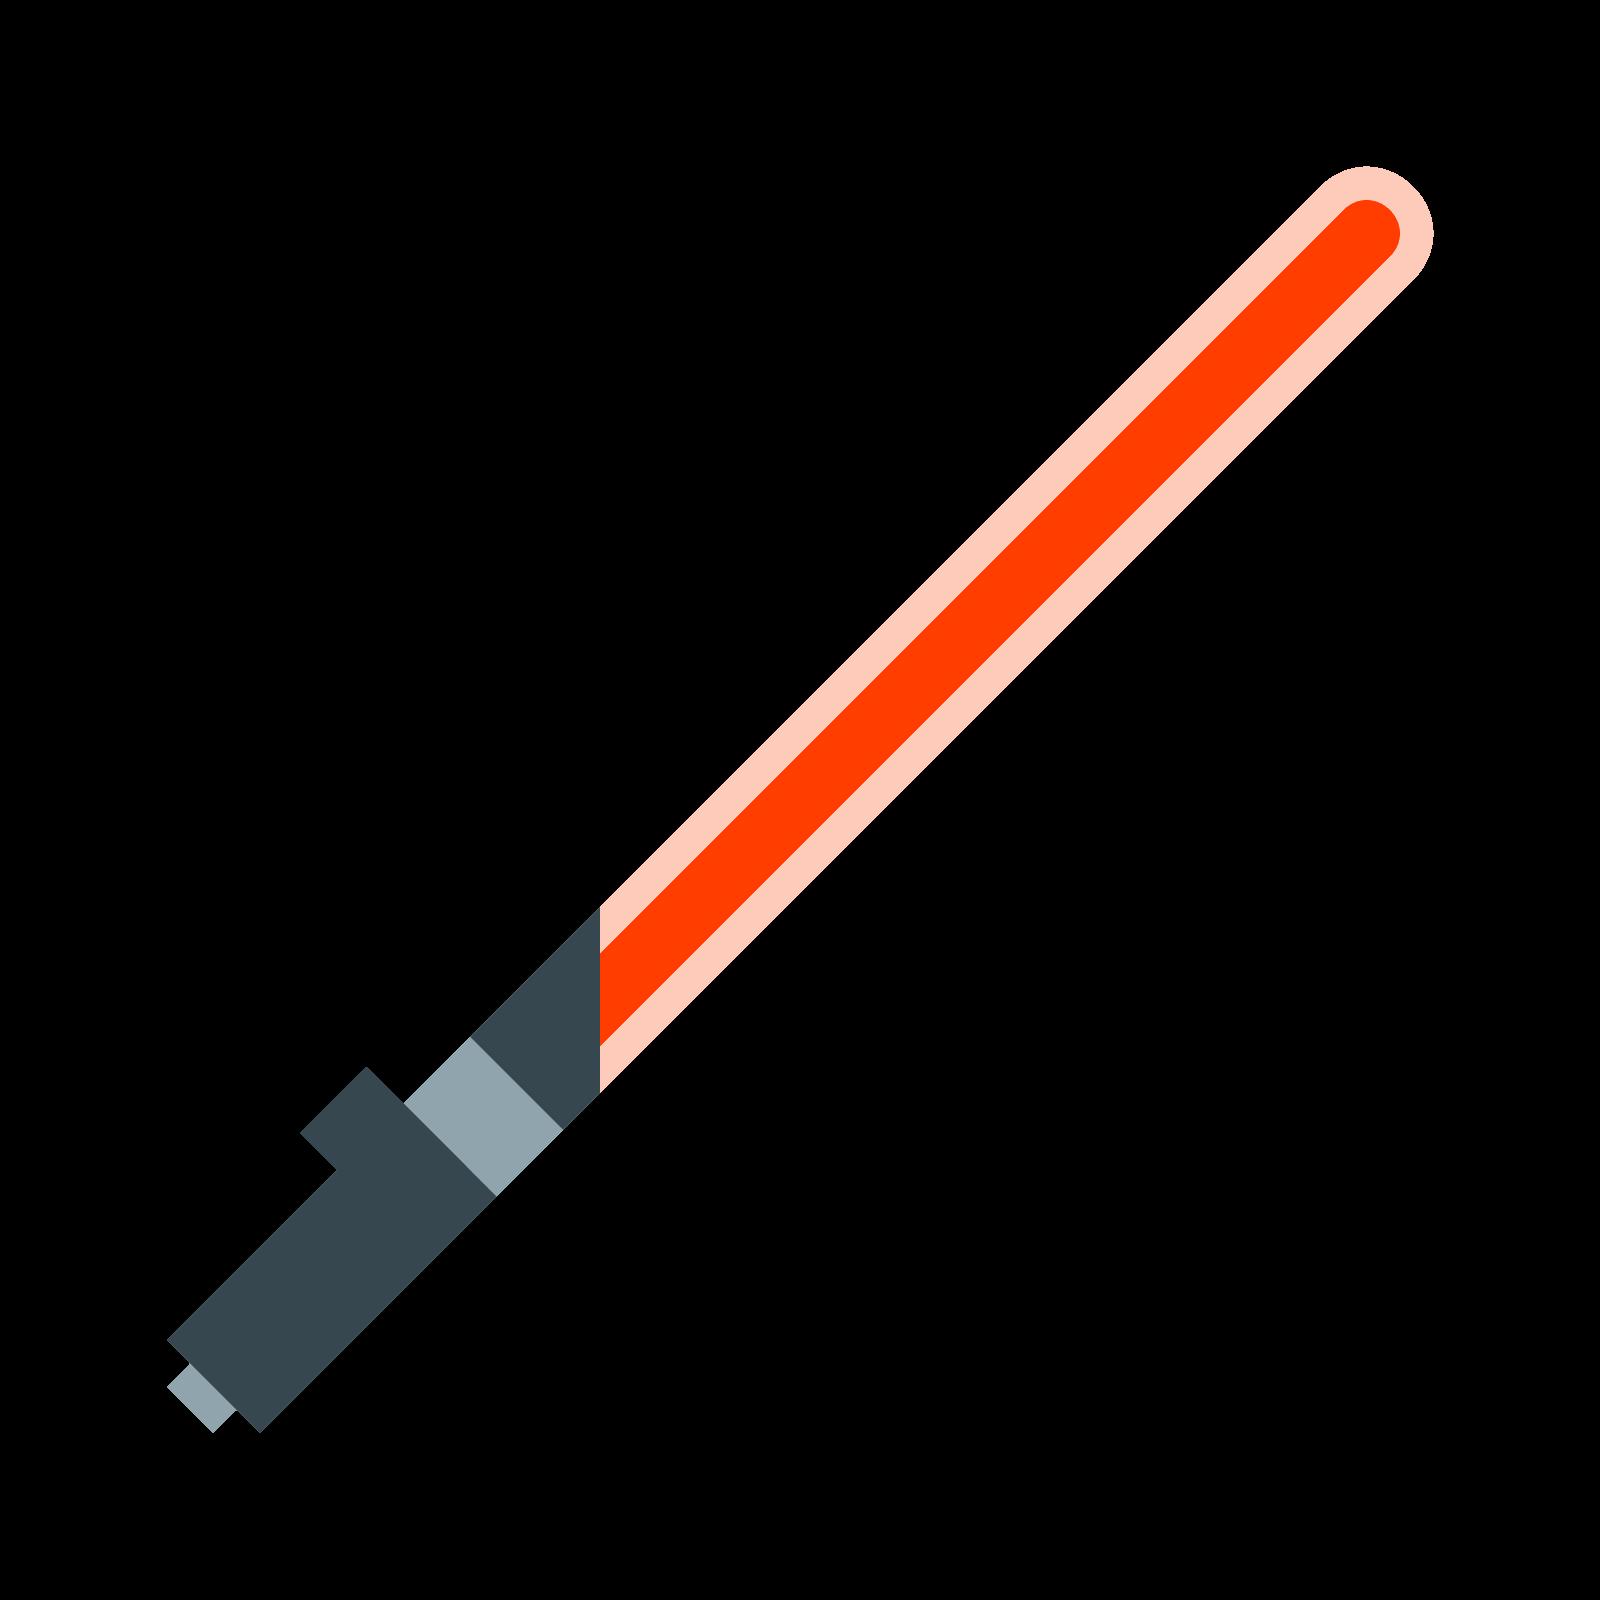 Lightsaber Vector